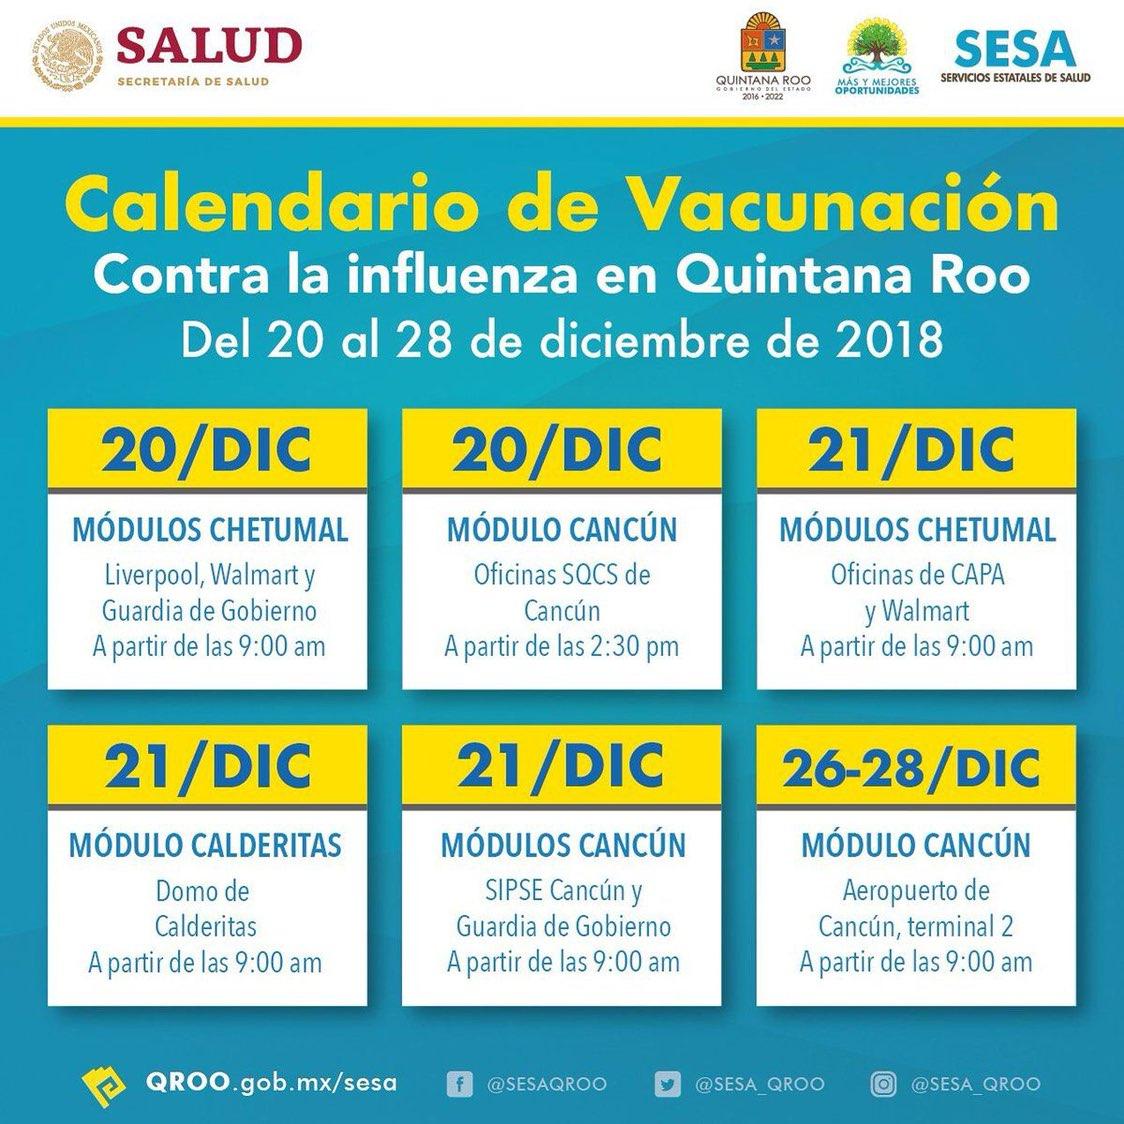 Gobierno Quintana Roo On Twitter Acude A Los Módulos O